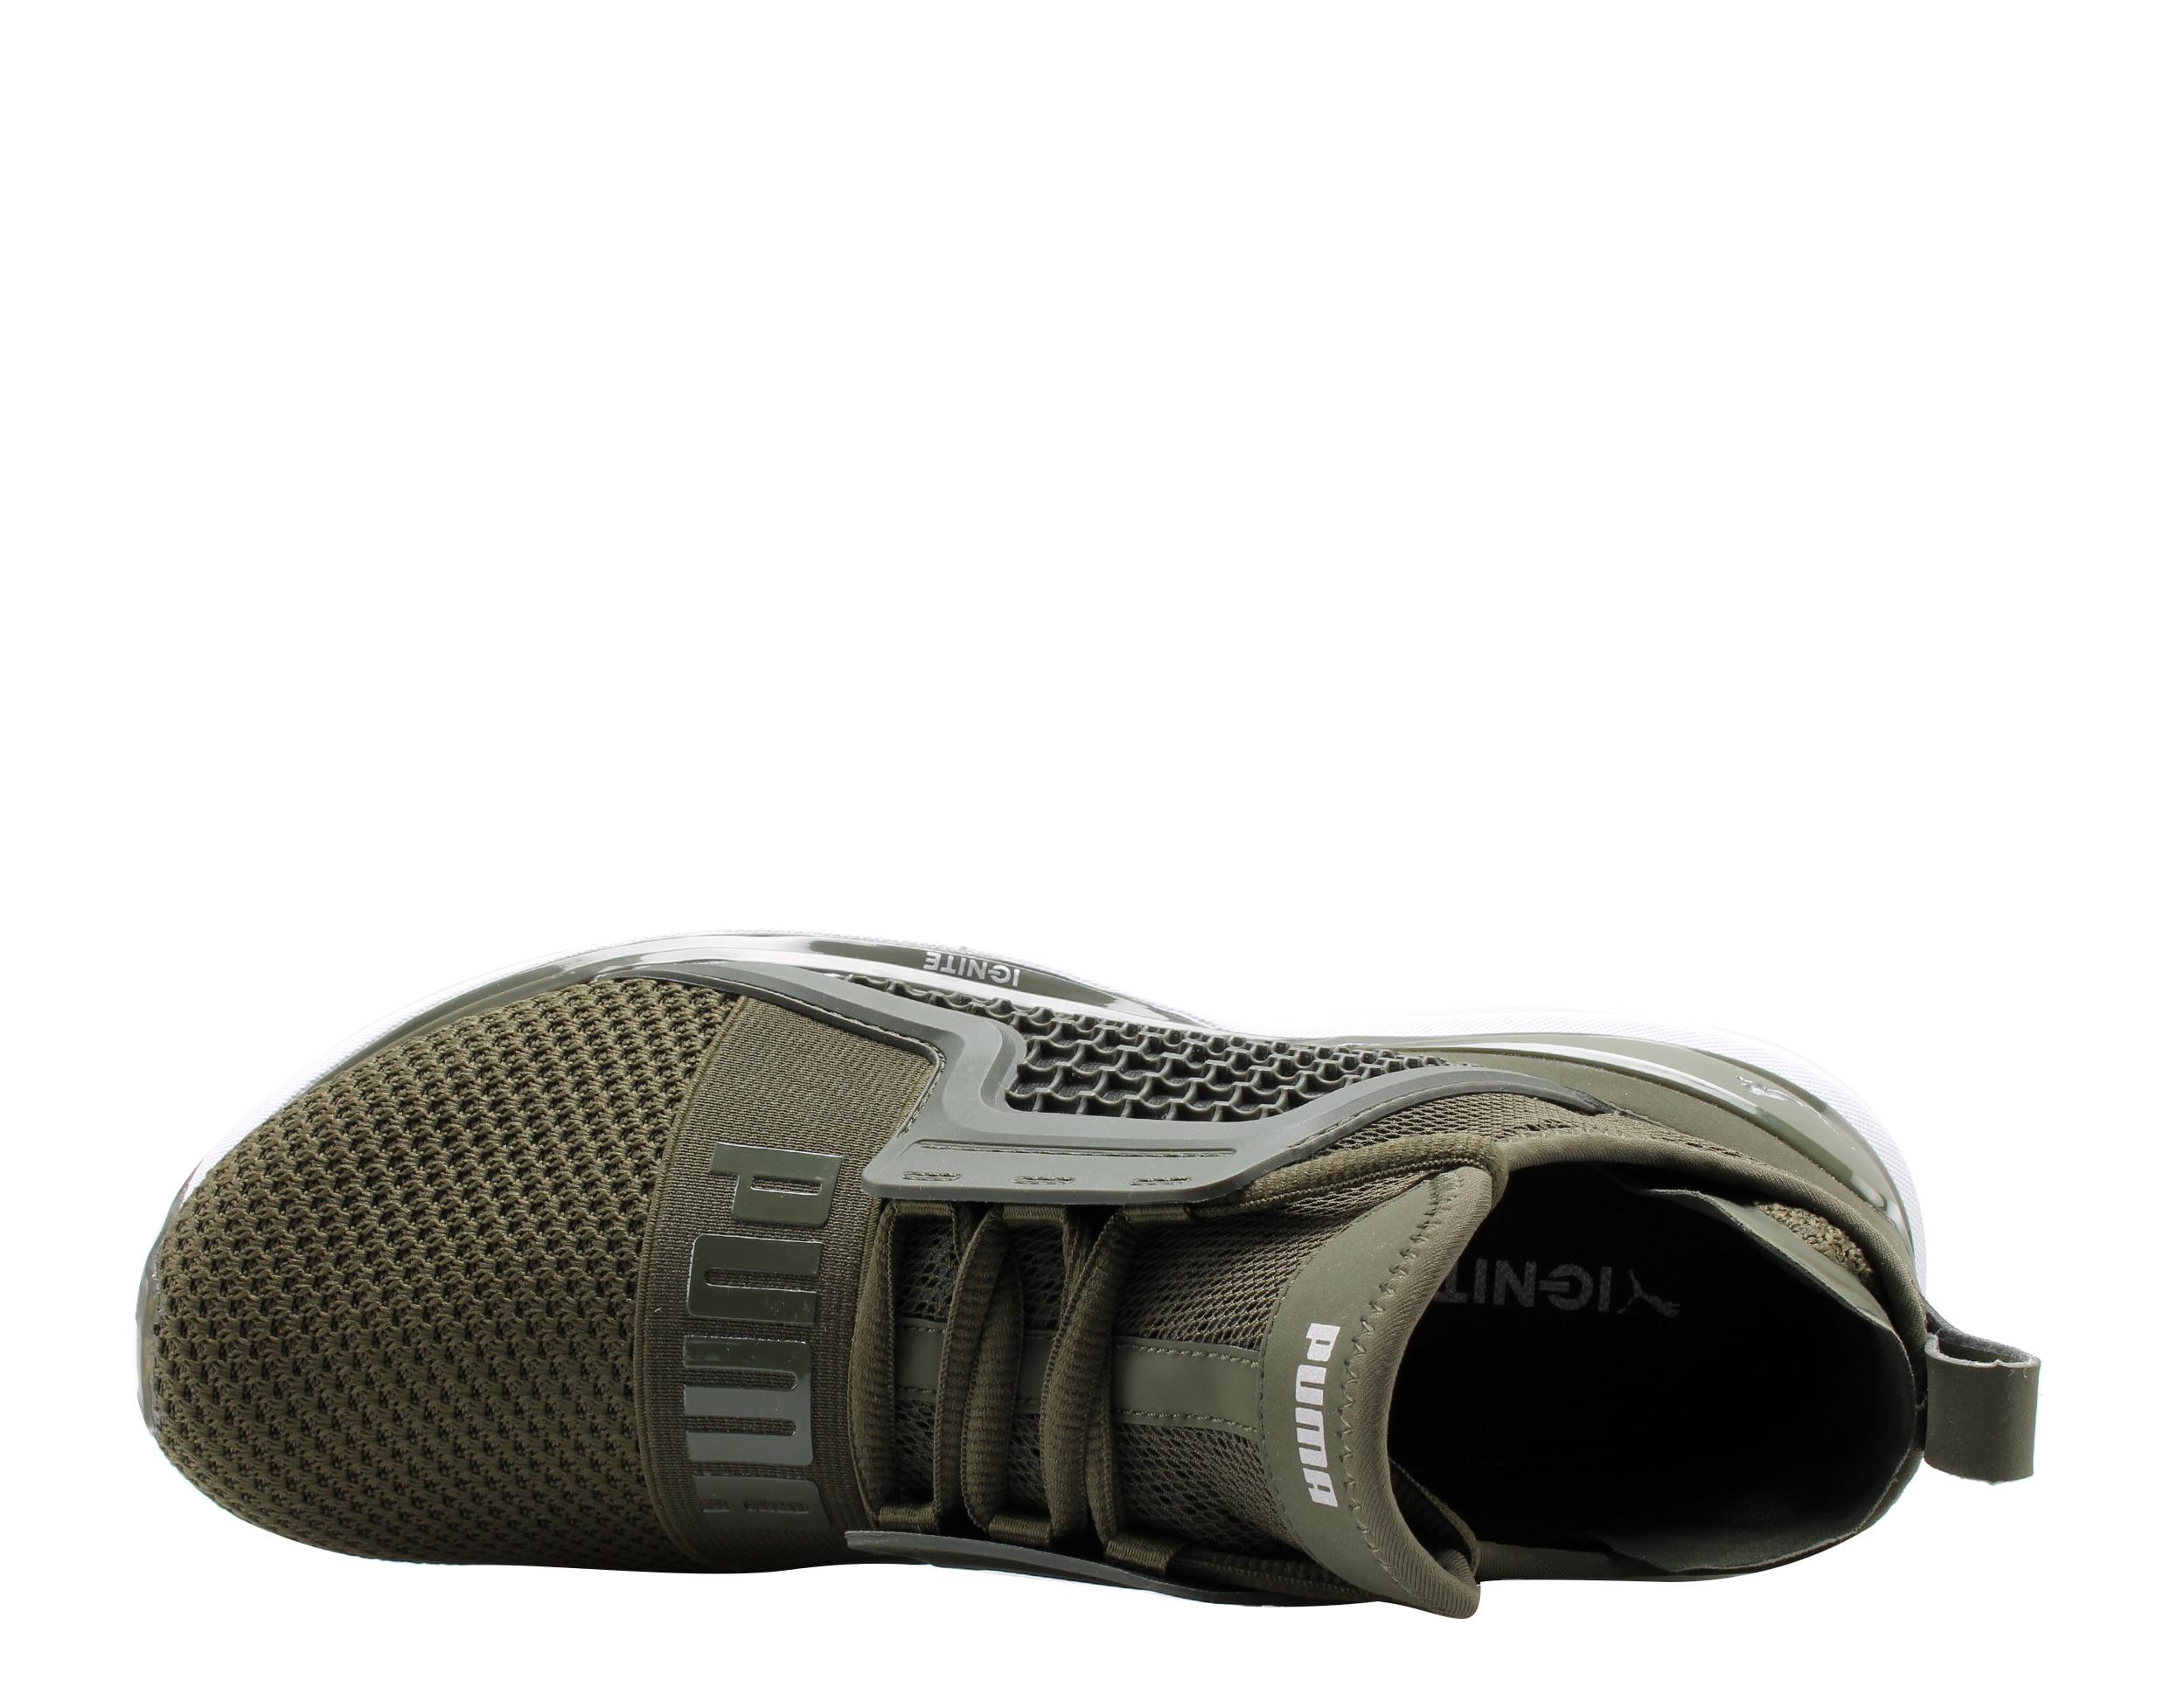 c18bac04d642 Puma - Puma IGNITE Limitless Weave Forest Night Olive Men s Running Shoes  19050301 - Walmart.com